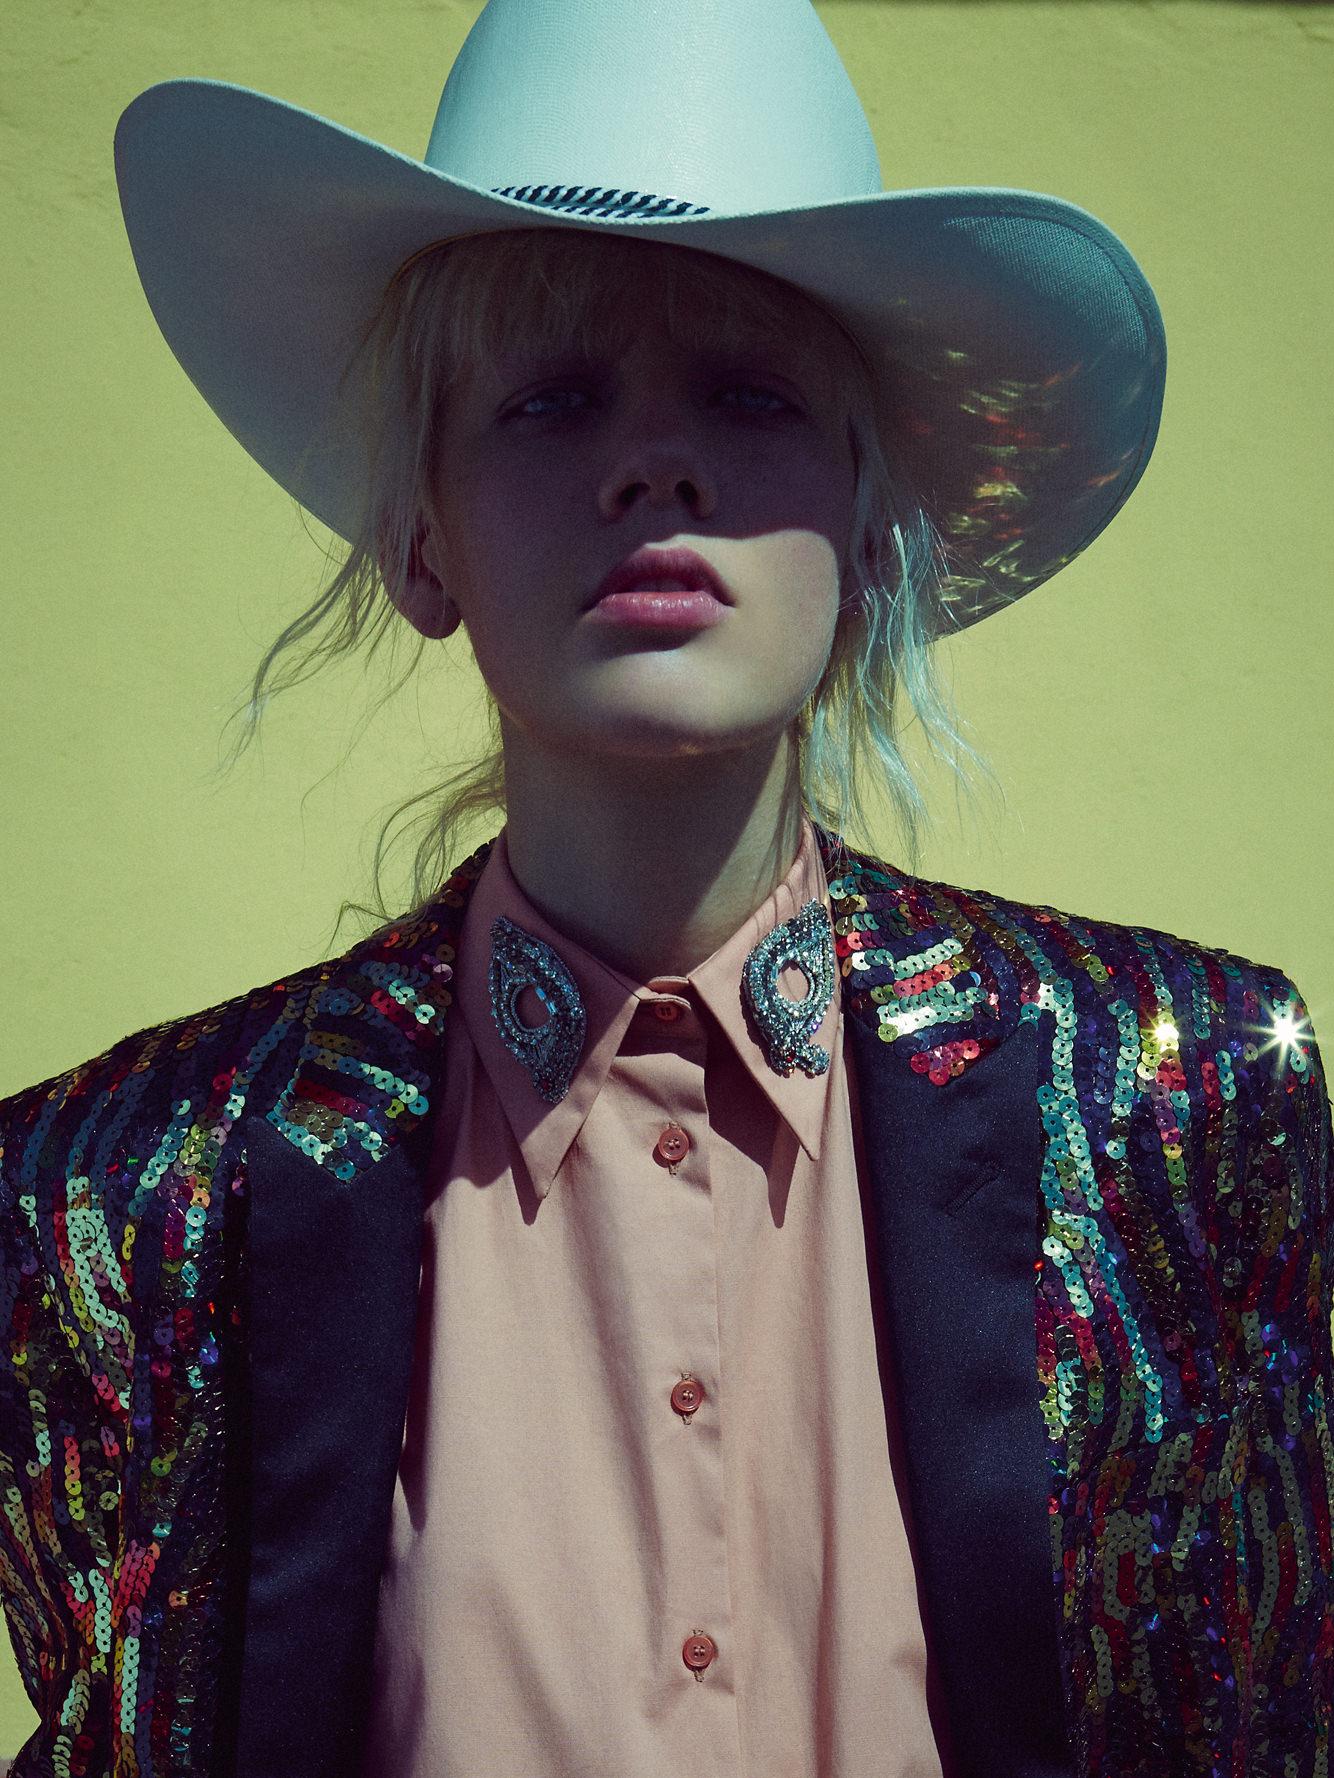 Jacket, SAINT LAURENT PAR HEDI SLIMANE. Shirt, ROCHAS. Vintage hat.